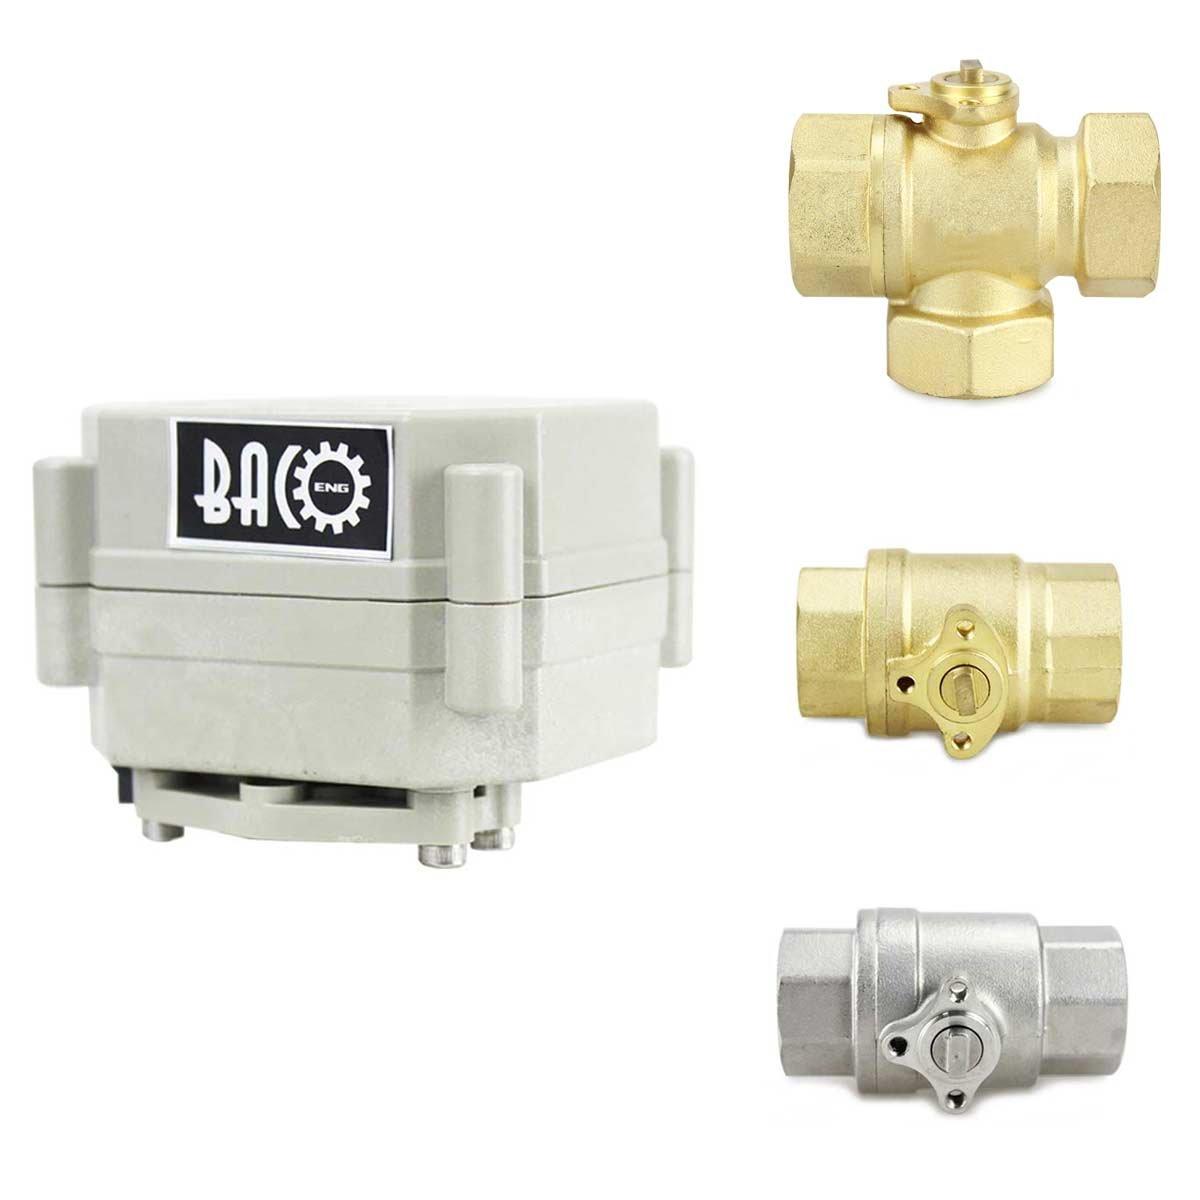 BACOENG 1 DN25 V/álvula Motorizada de Esfera de 3 V/ías de Lat/ón de AC110//230V CR202 NC